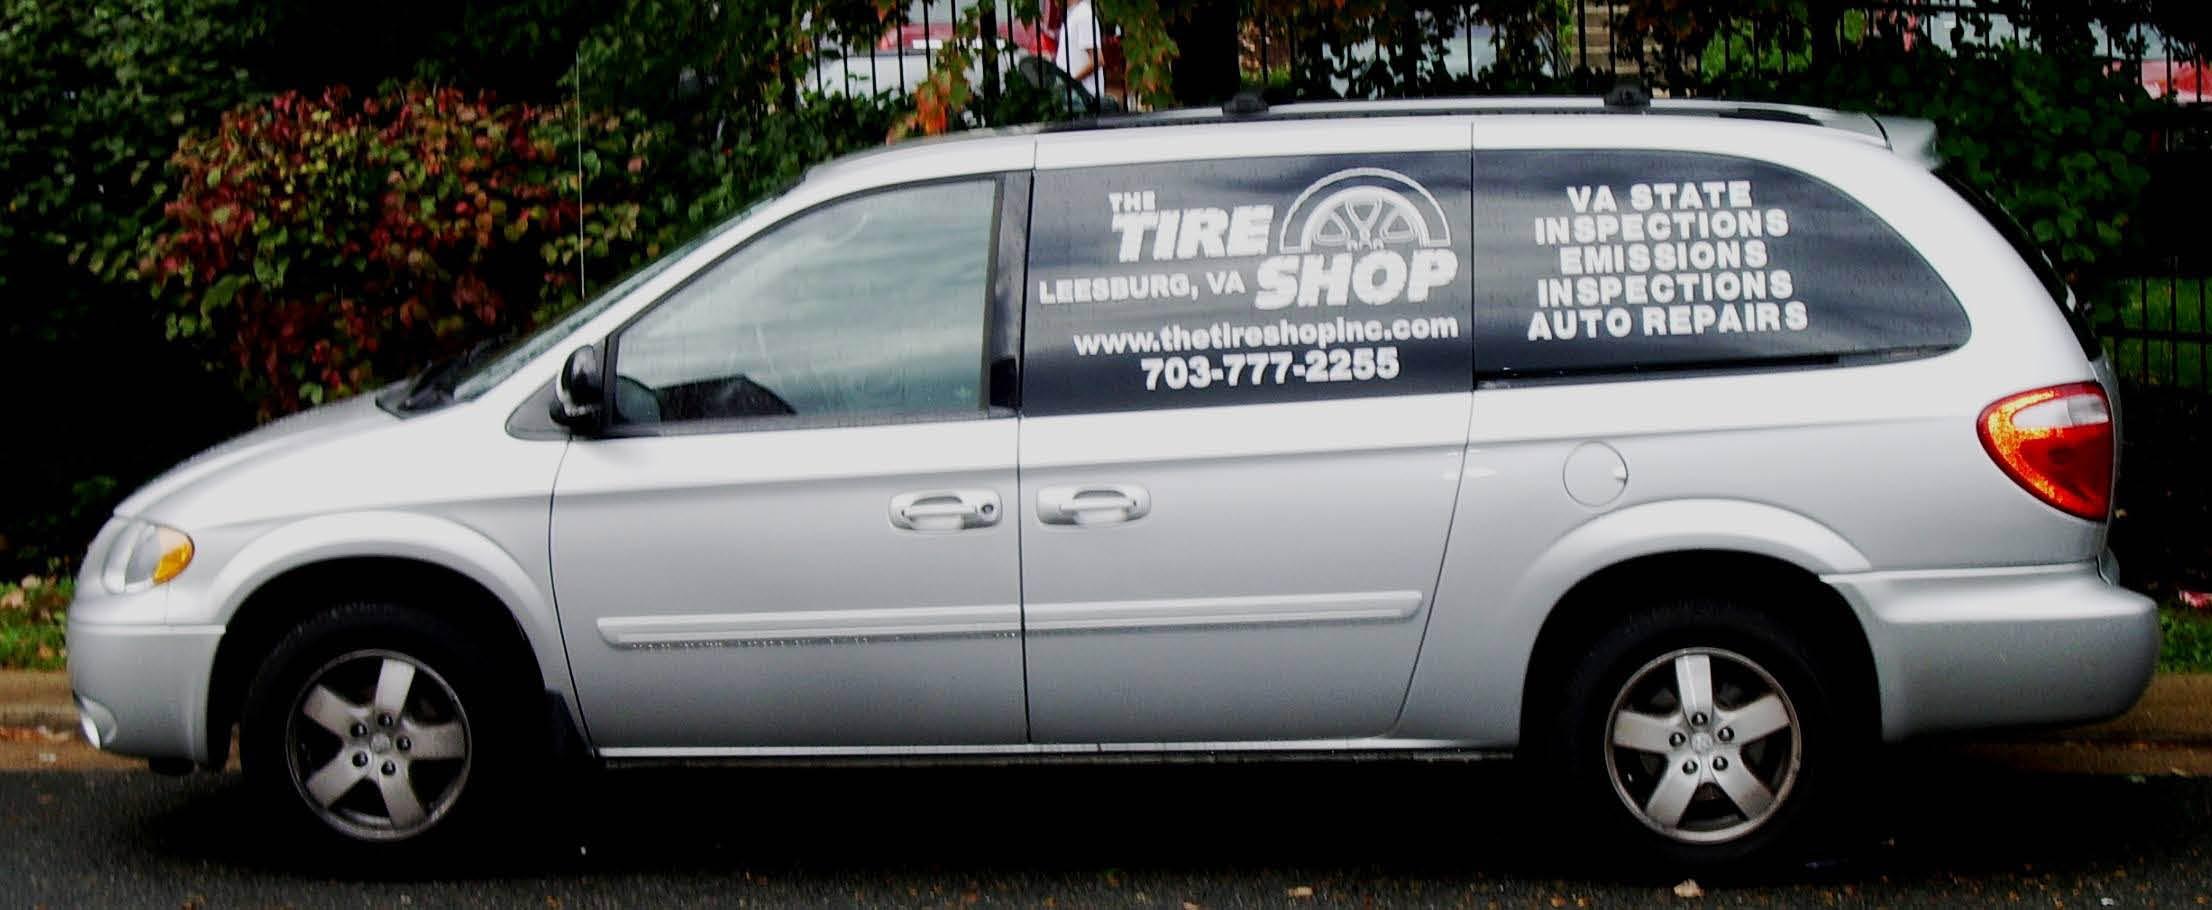 auto repair, tires, wheels; leesburg, va